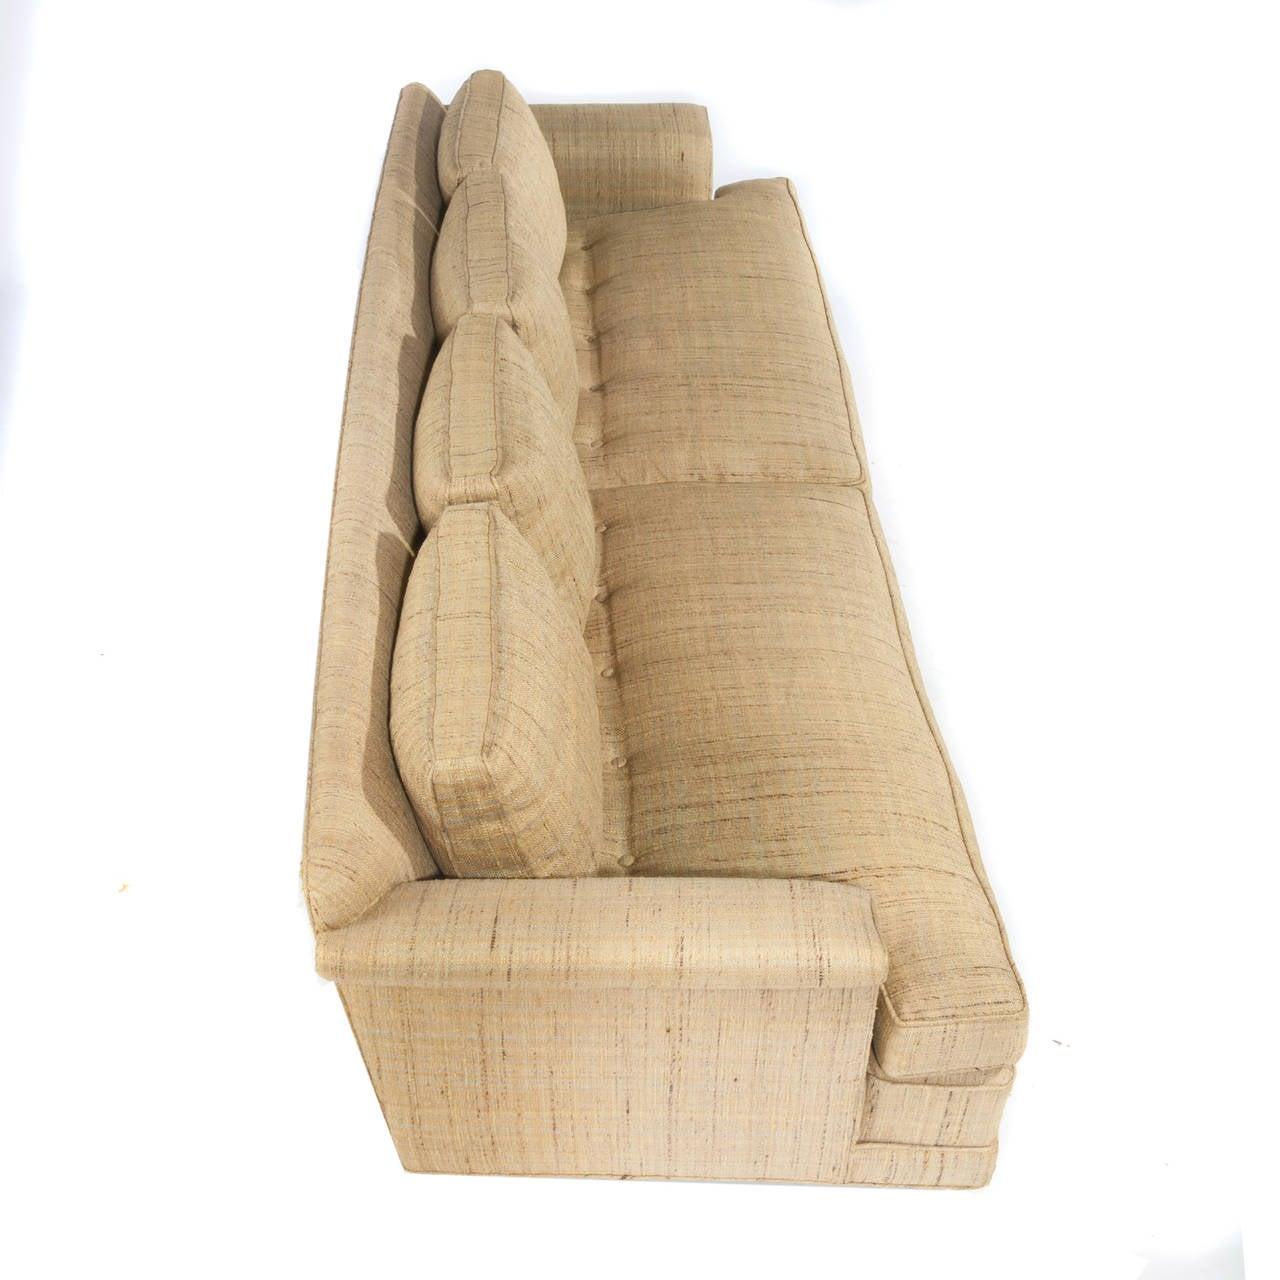 1950s Four-Seat Sofa by Edward Wormley for Dunbar 5